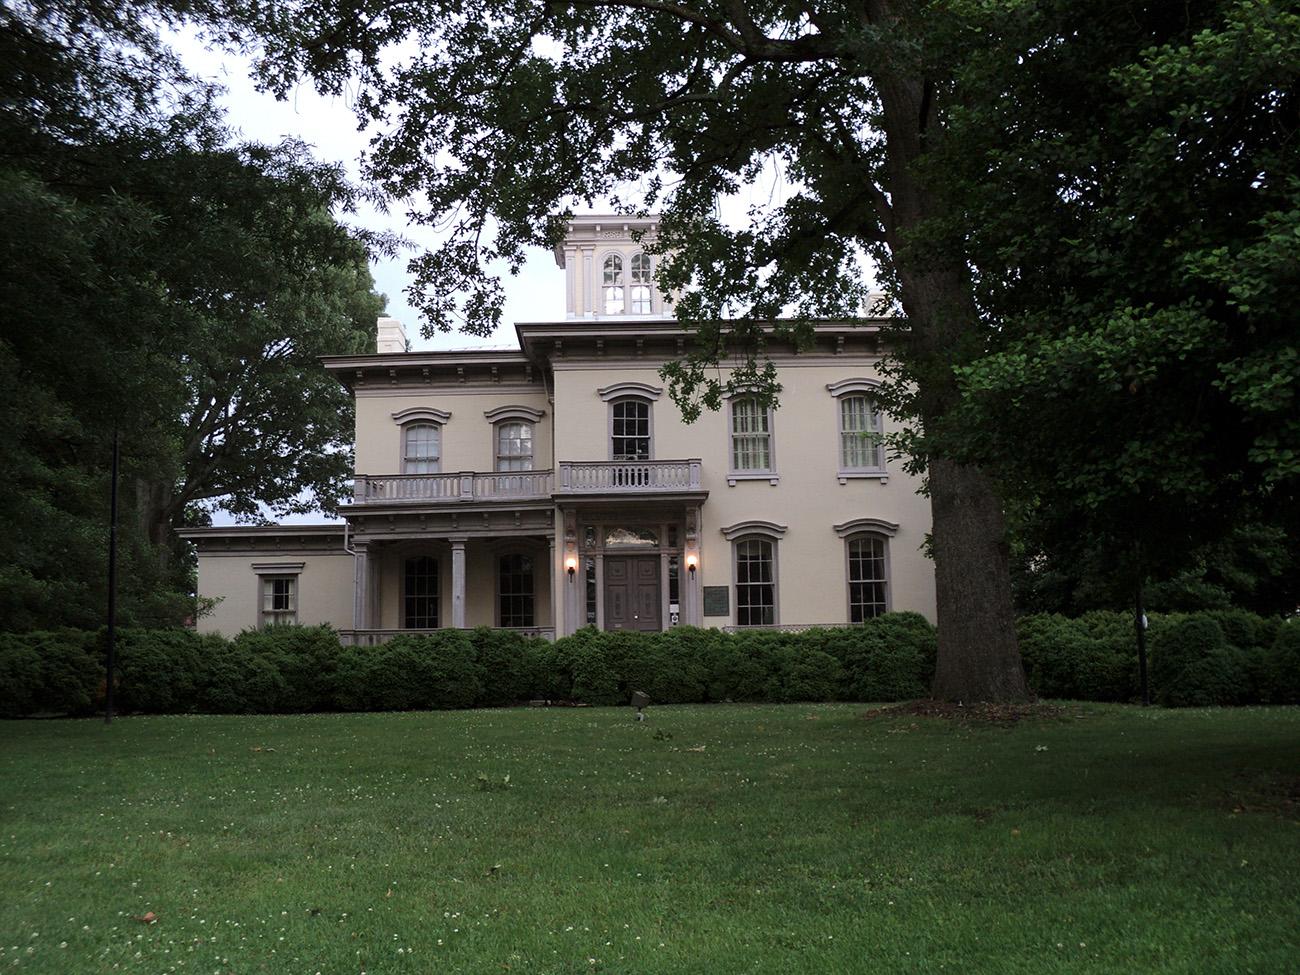 William_T_Sutherlin_Mansion_Danville_Virginia.JPG